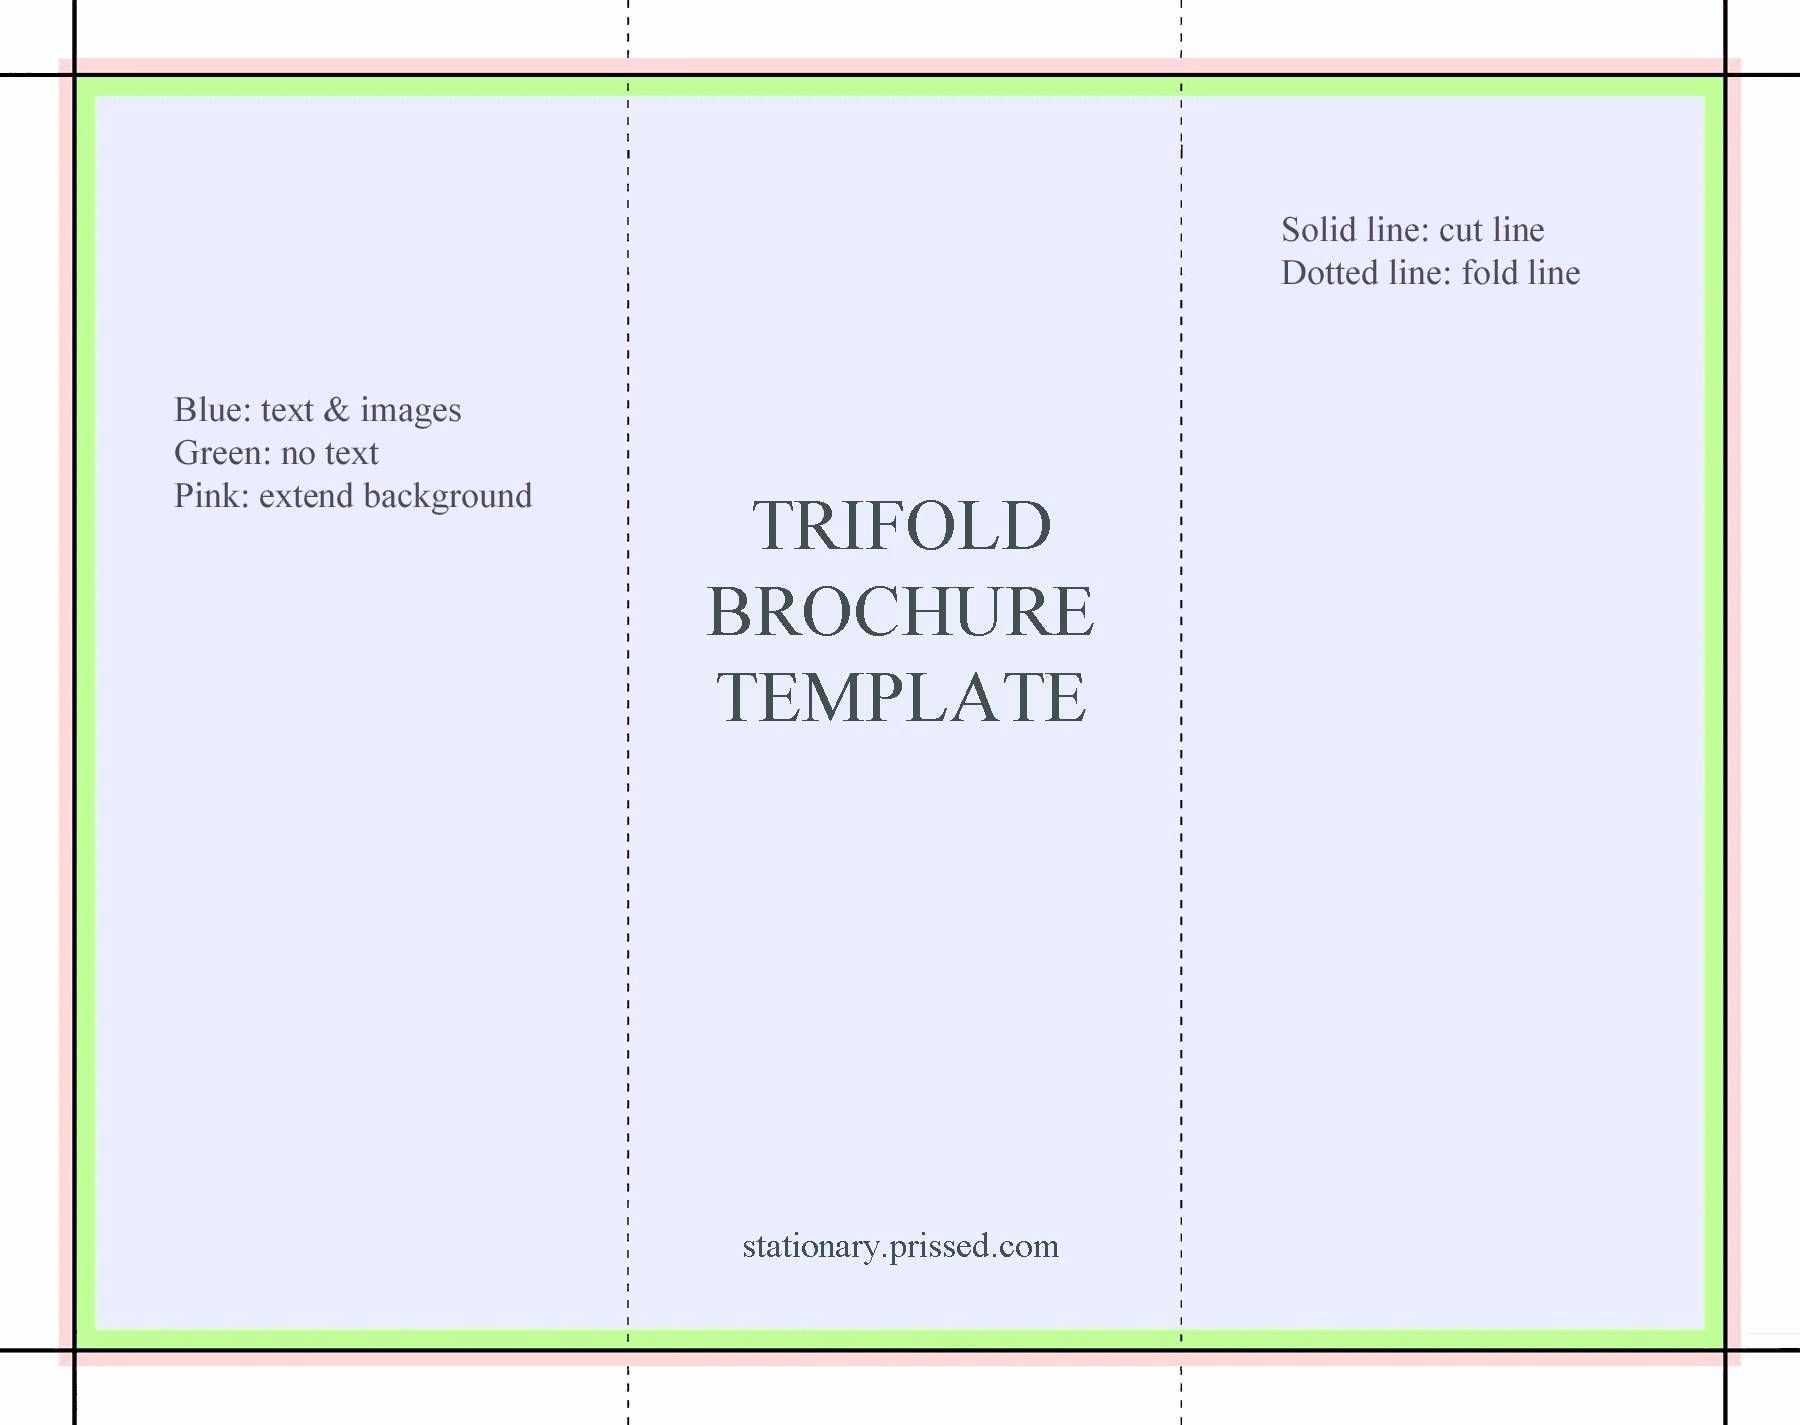 Unforgettable Google Docs Brochure Templates Template Ideas In Google Drive Brochure Templates